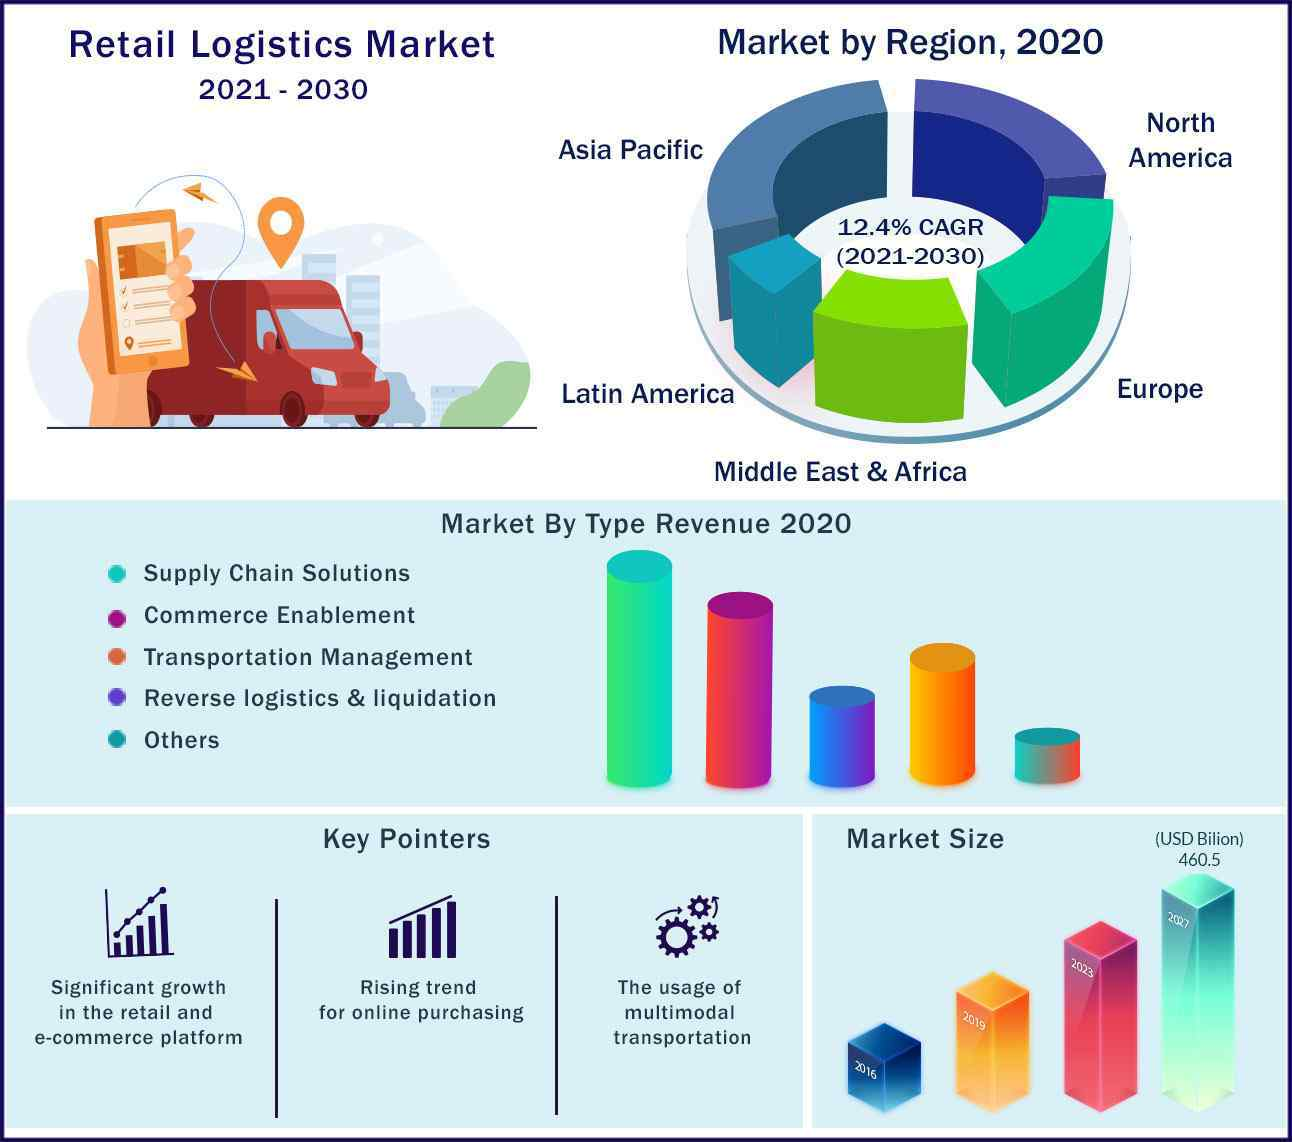 Global Retail Logistics Market 2021-2030